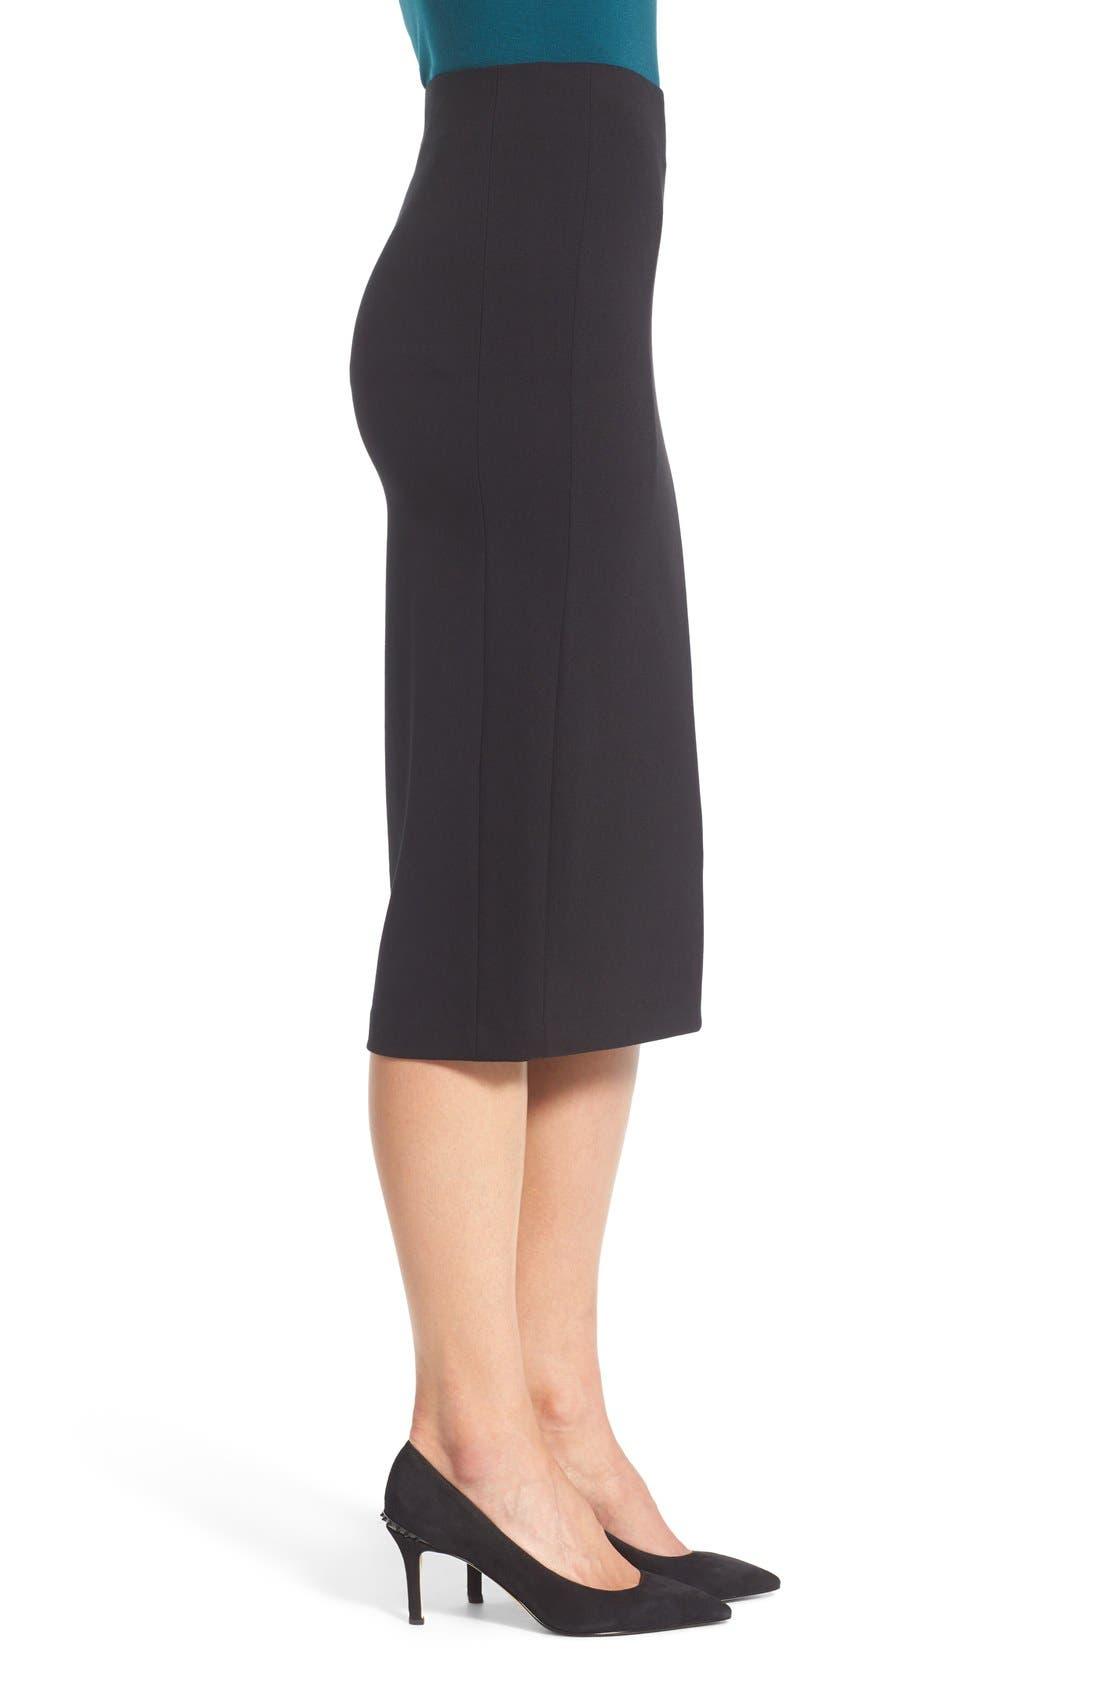 VINCE CAMUTO, Ponte Midi Skirt, Alternate thumbnail 3, color, RICH BLACK